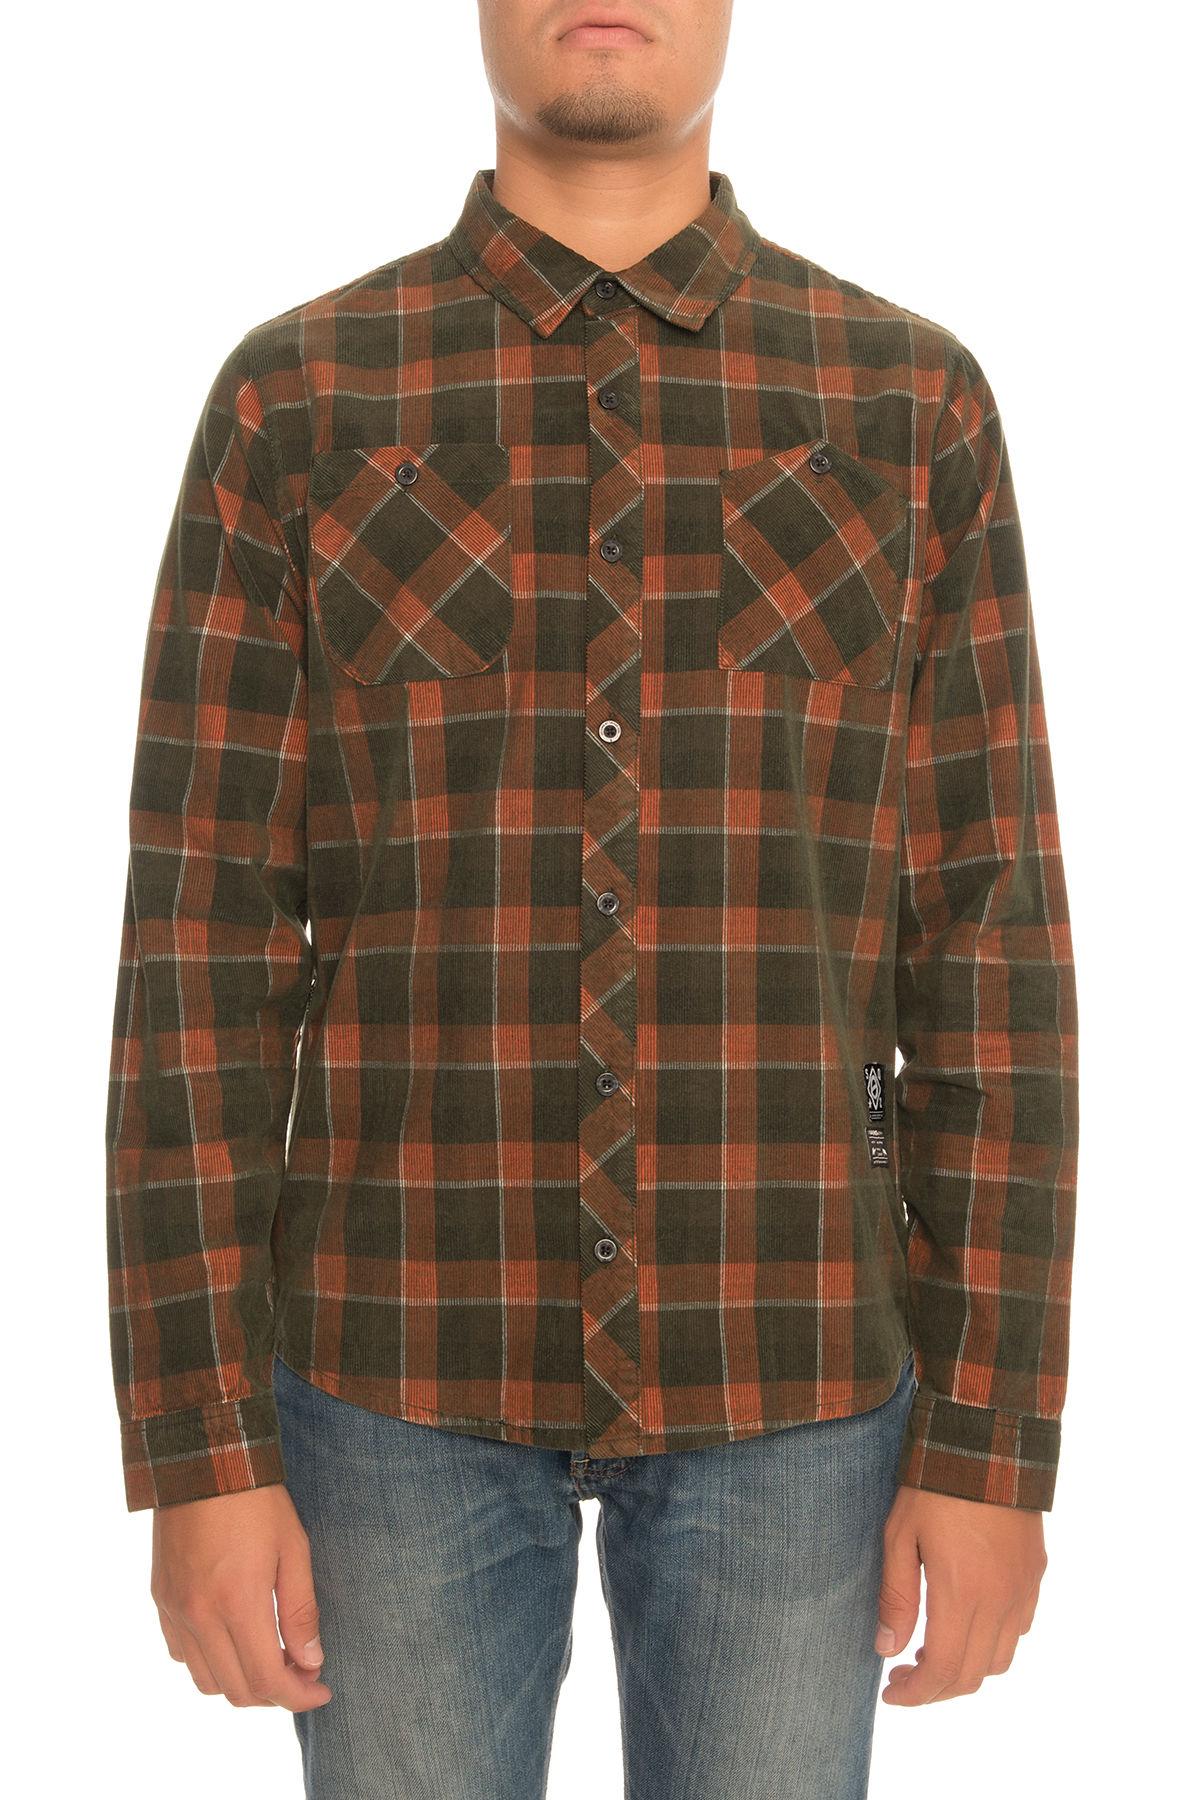 Image of SquareZero Premium Plaid Corduroy Long Sleeve Button Down Shirt in Olive & Burnt Orange Colorway